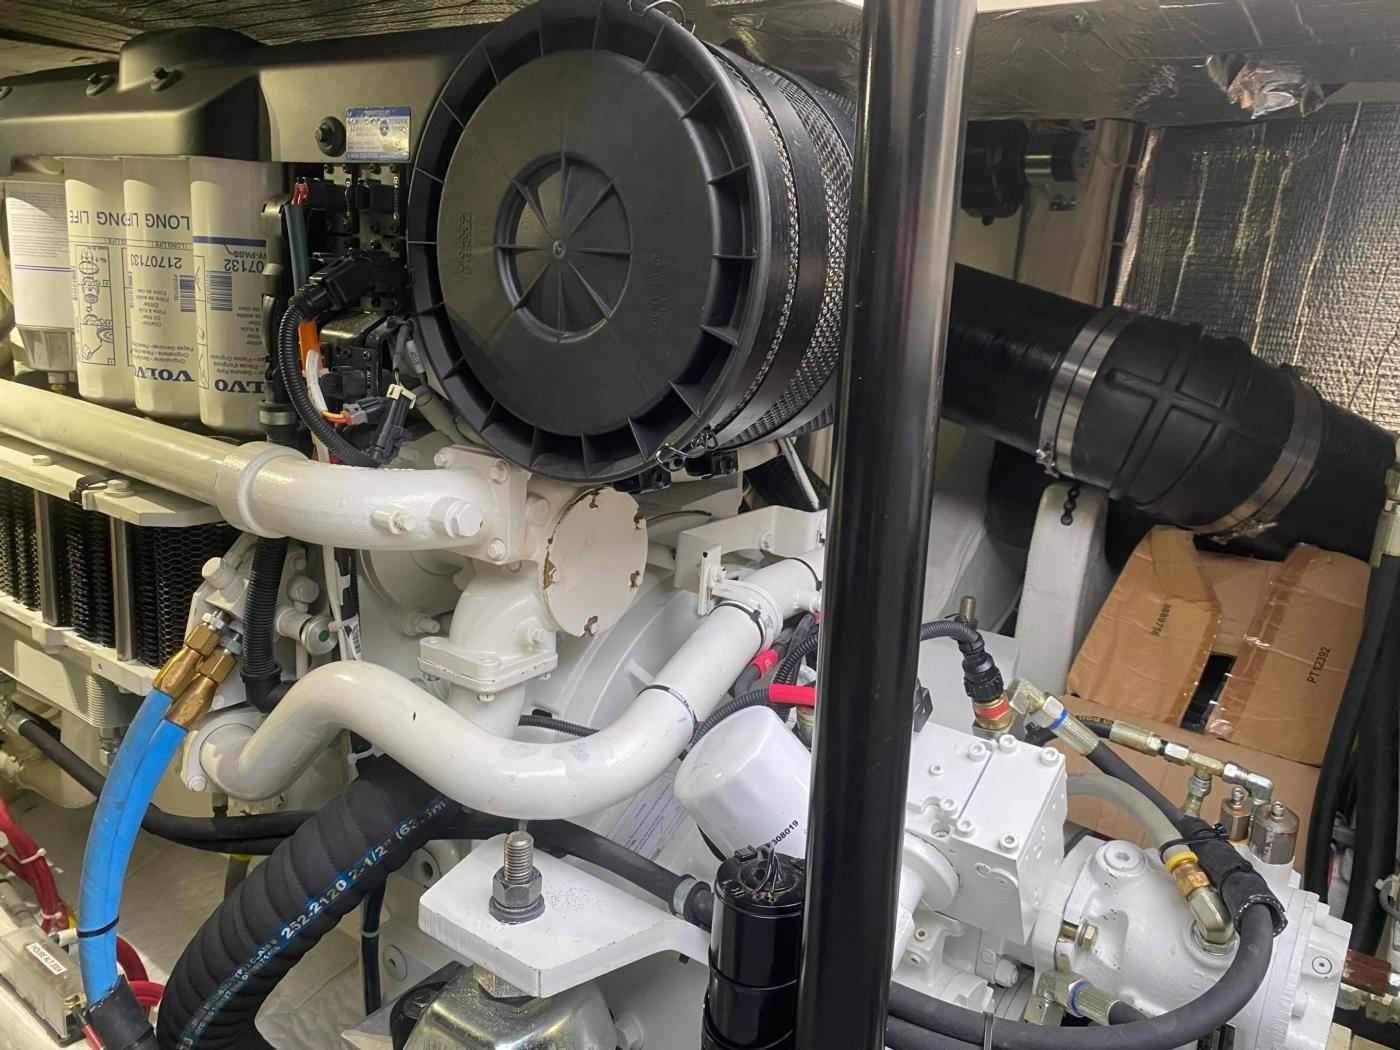 2018 Hinckley Talaria 48 MKII, Machinery space detail 1